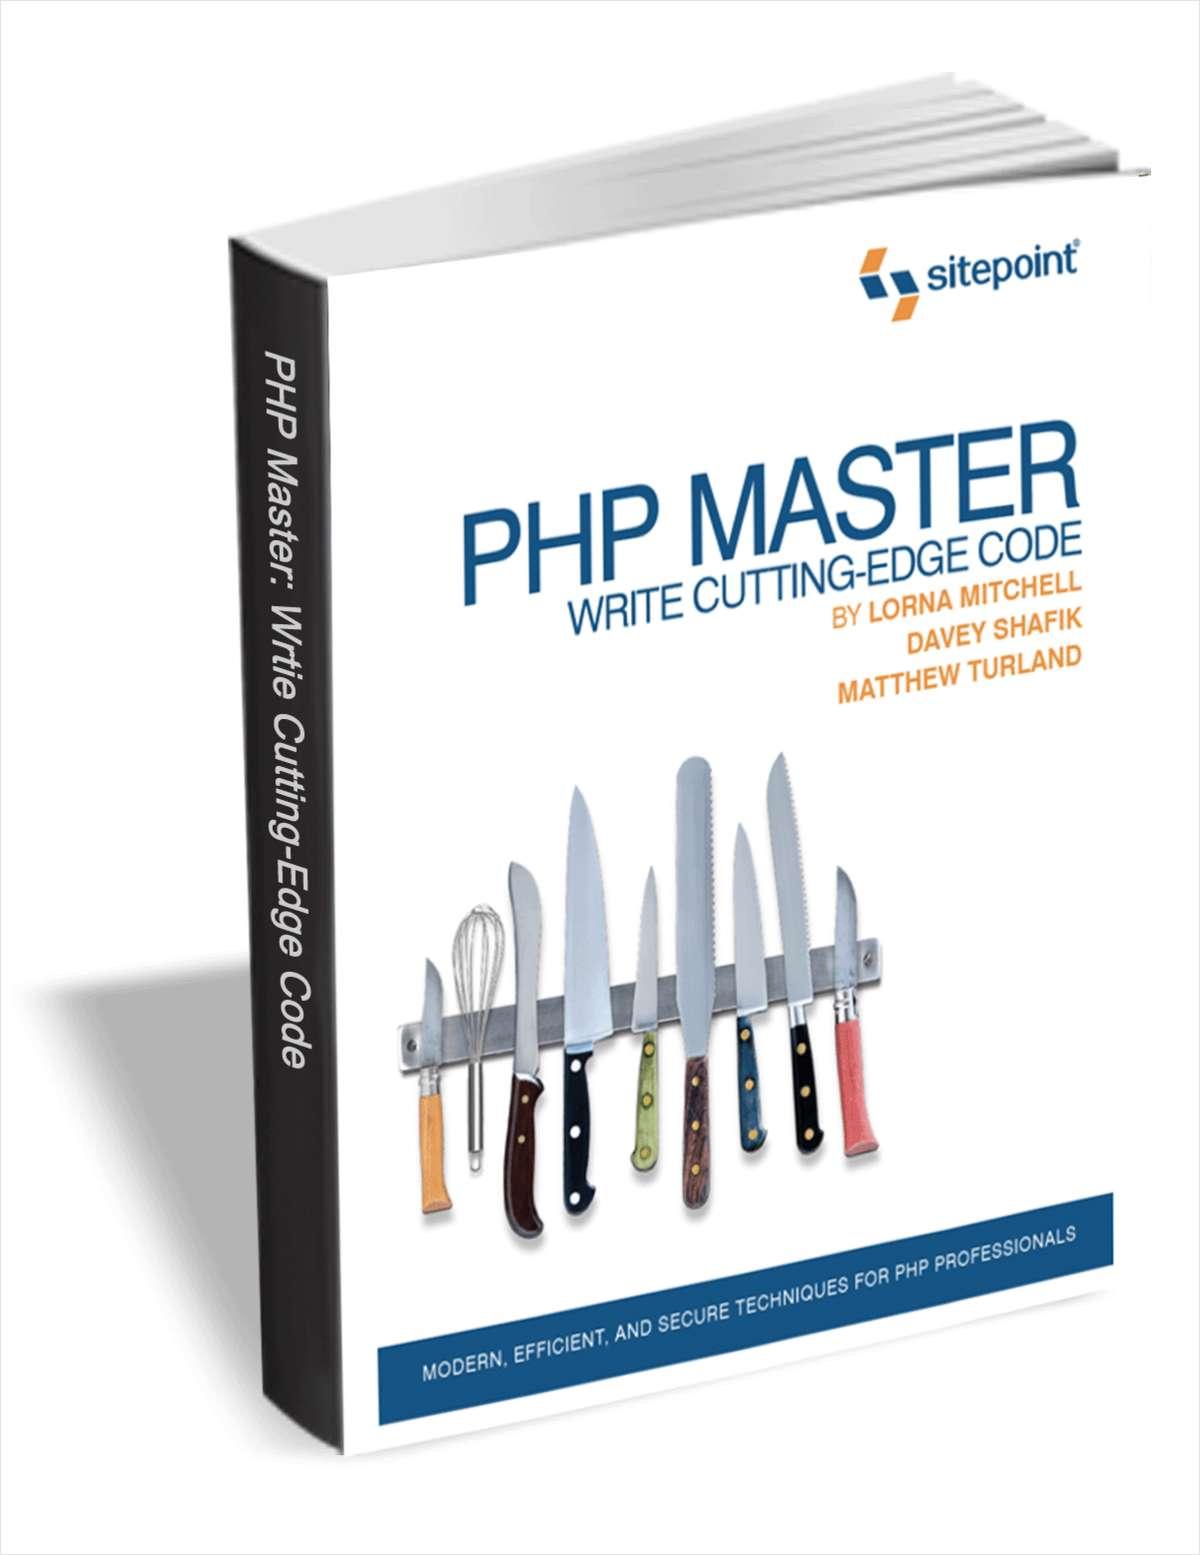 PHP Master: Write Cutting-edge Code (Free eBook!) A $30 Value